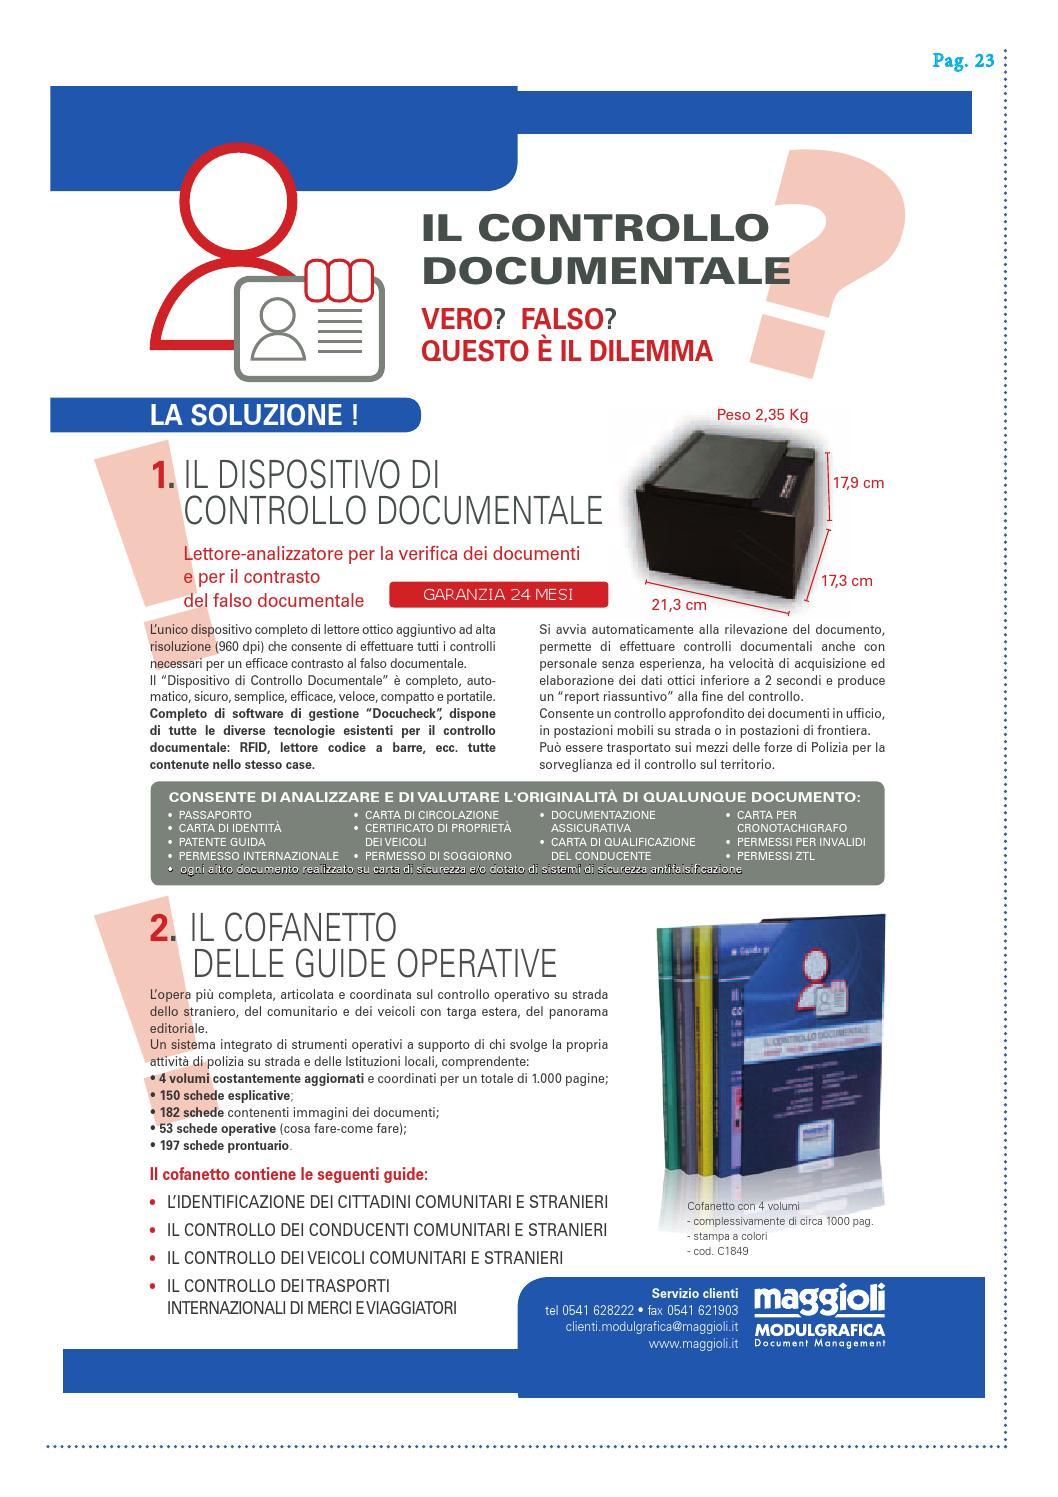 Notiziario ANUSCA 2016 - 04 - Aprile by ANUSCA - issuu